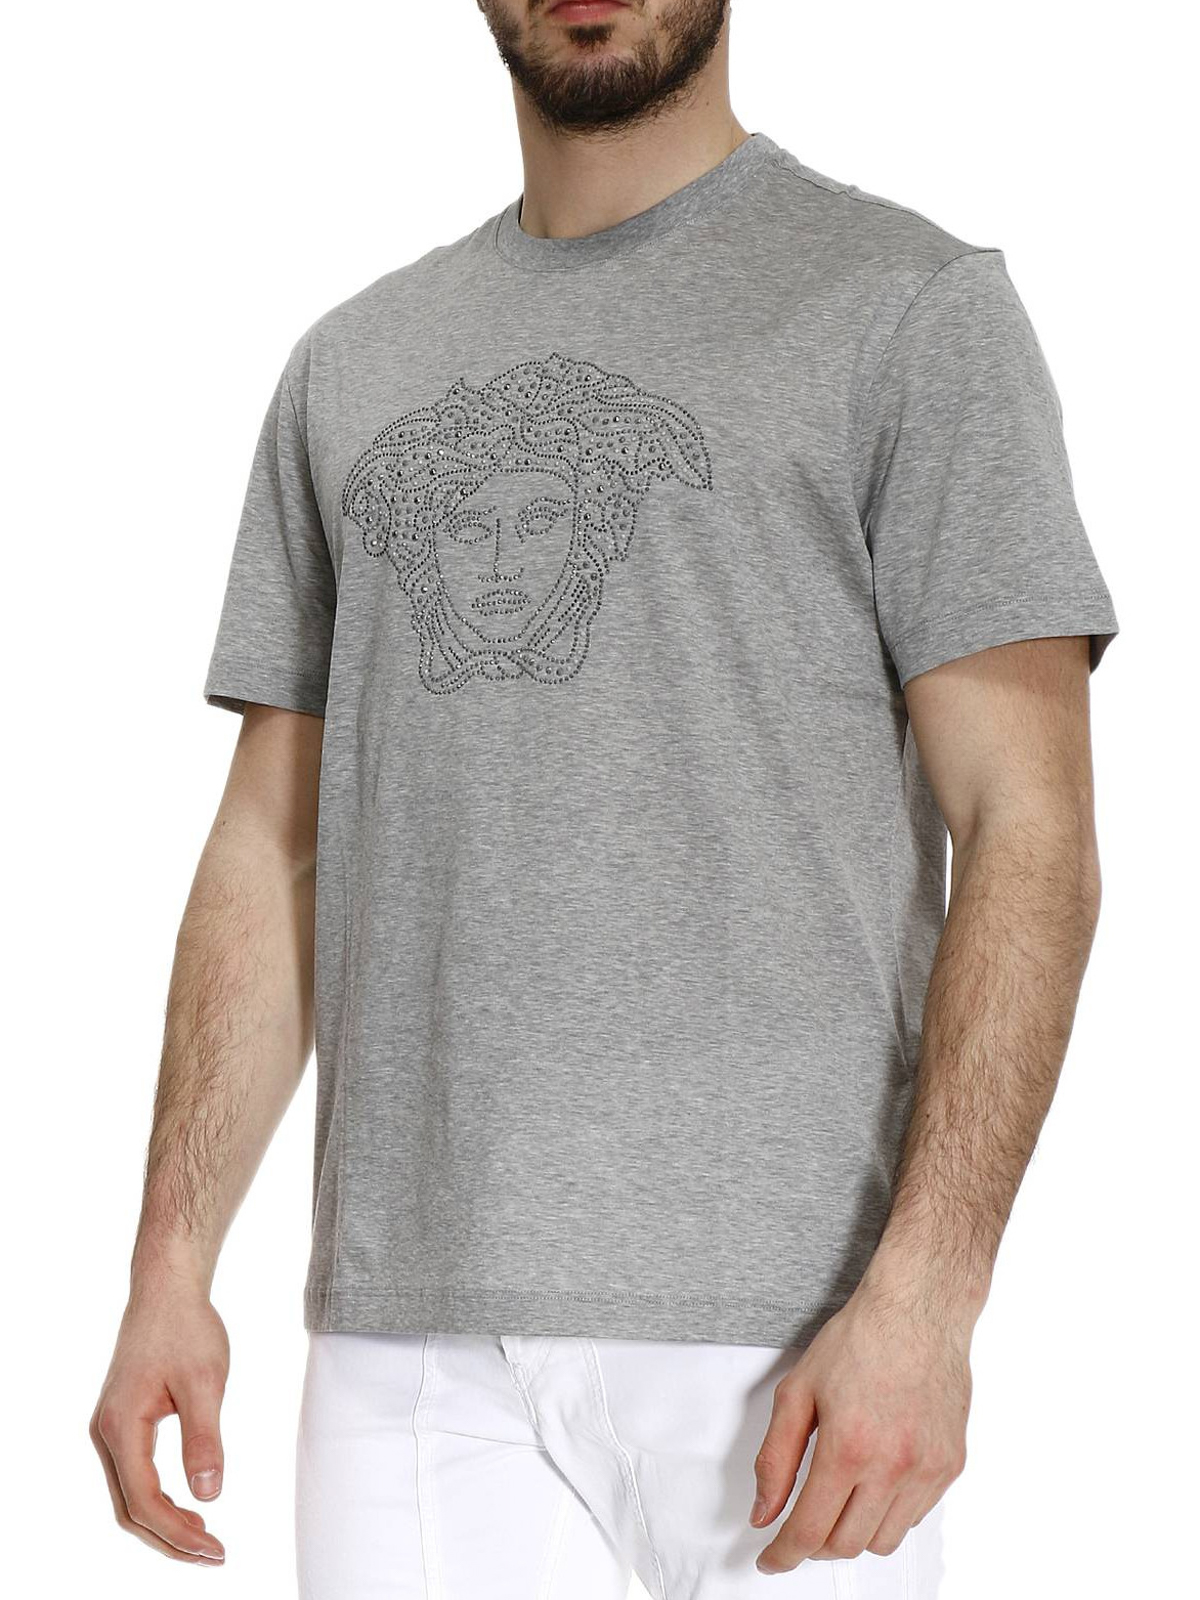 grey versace t shirt